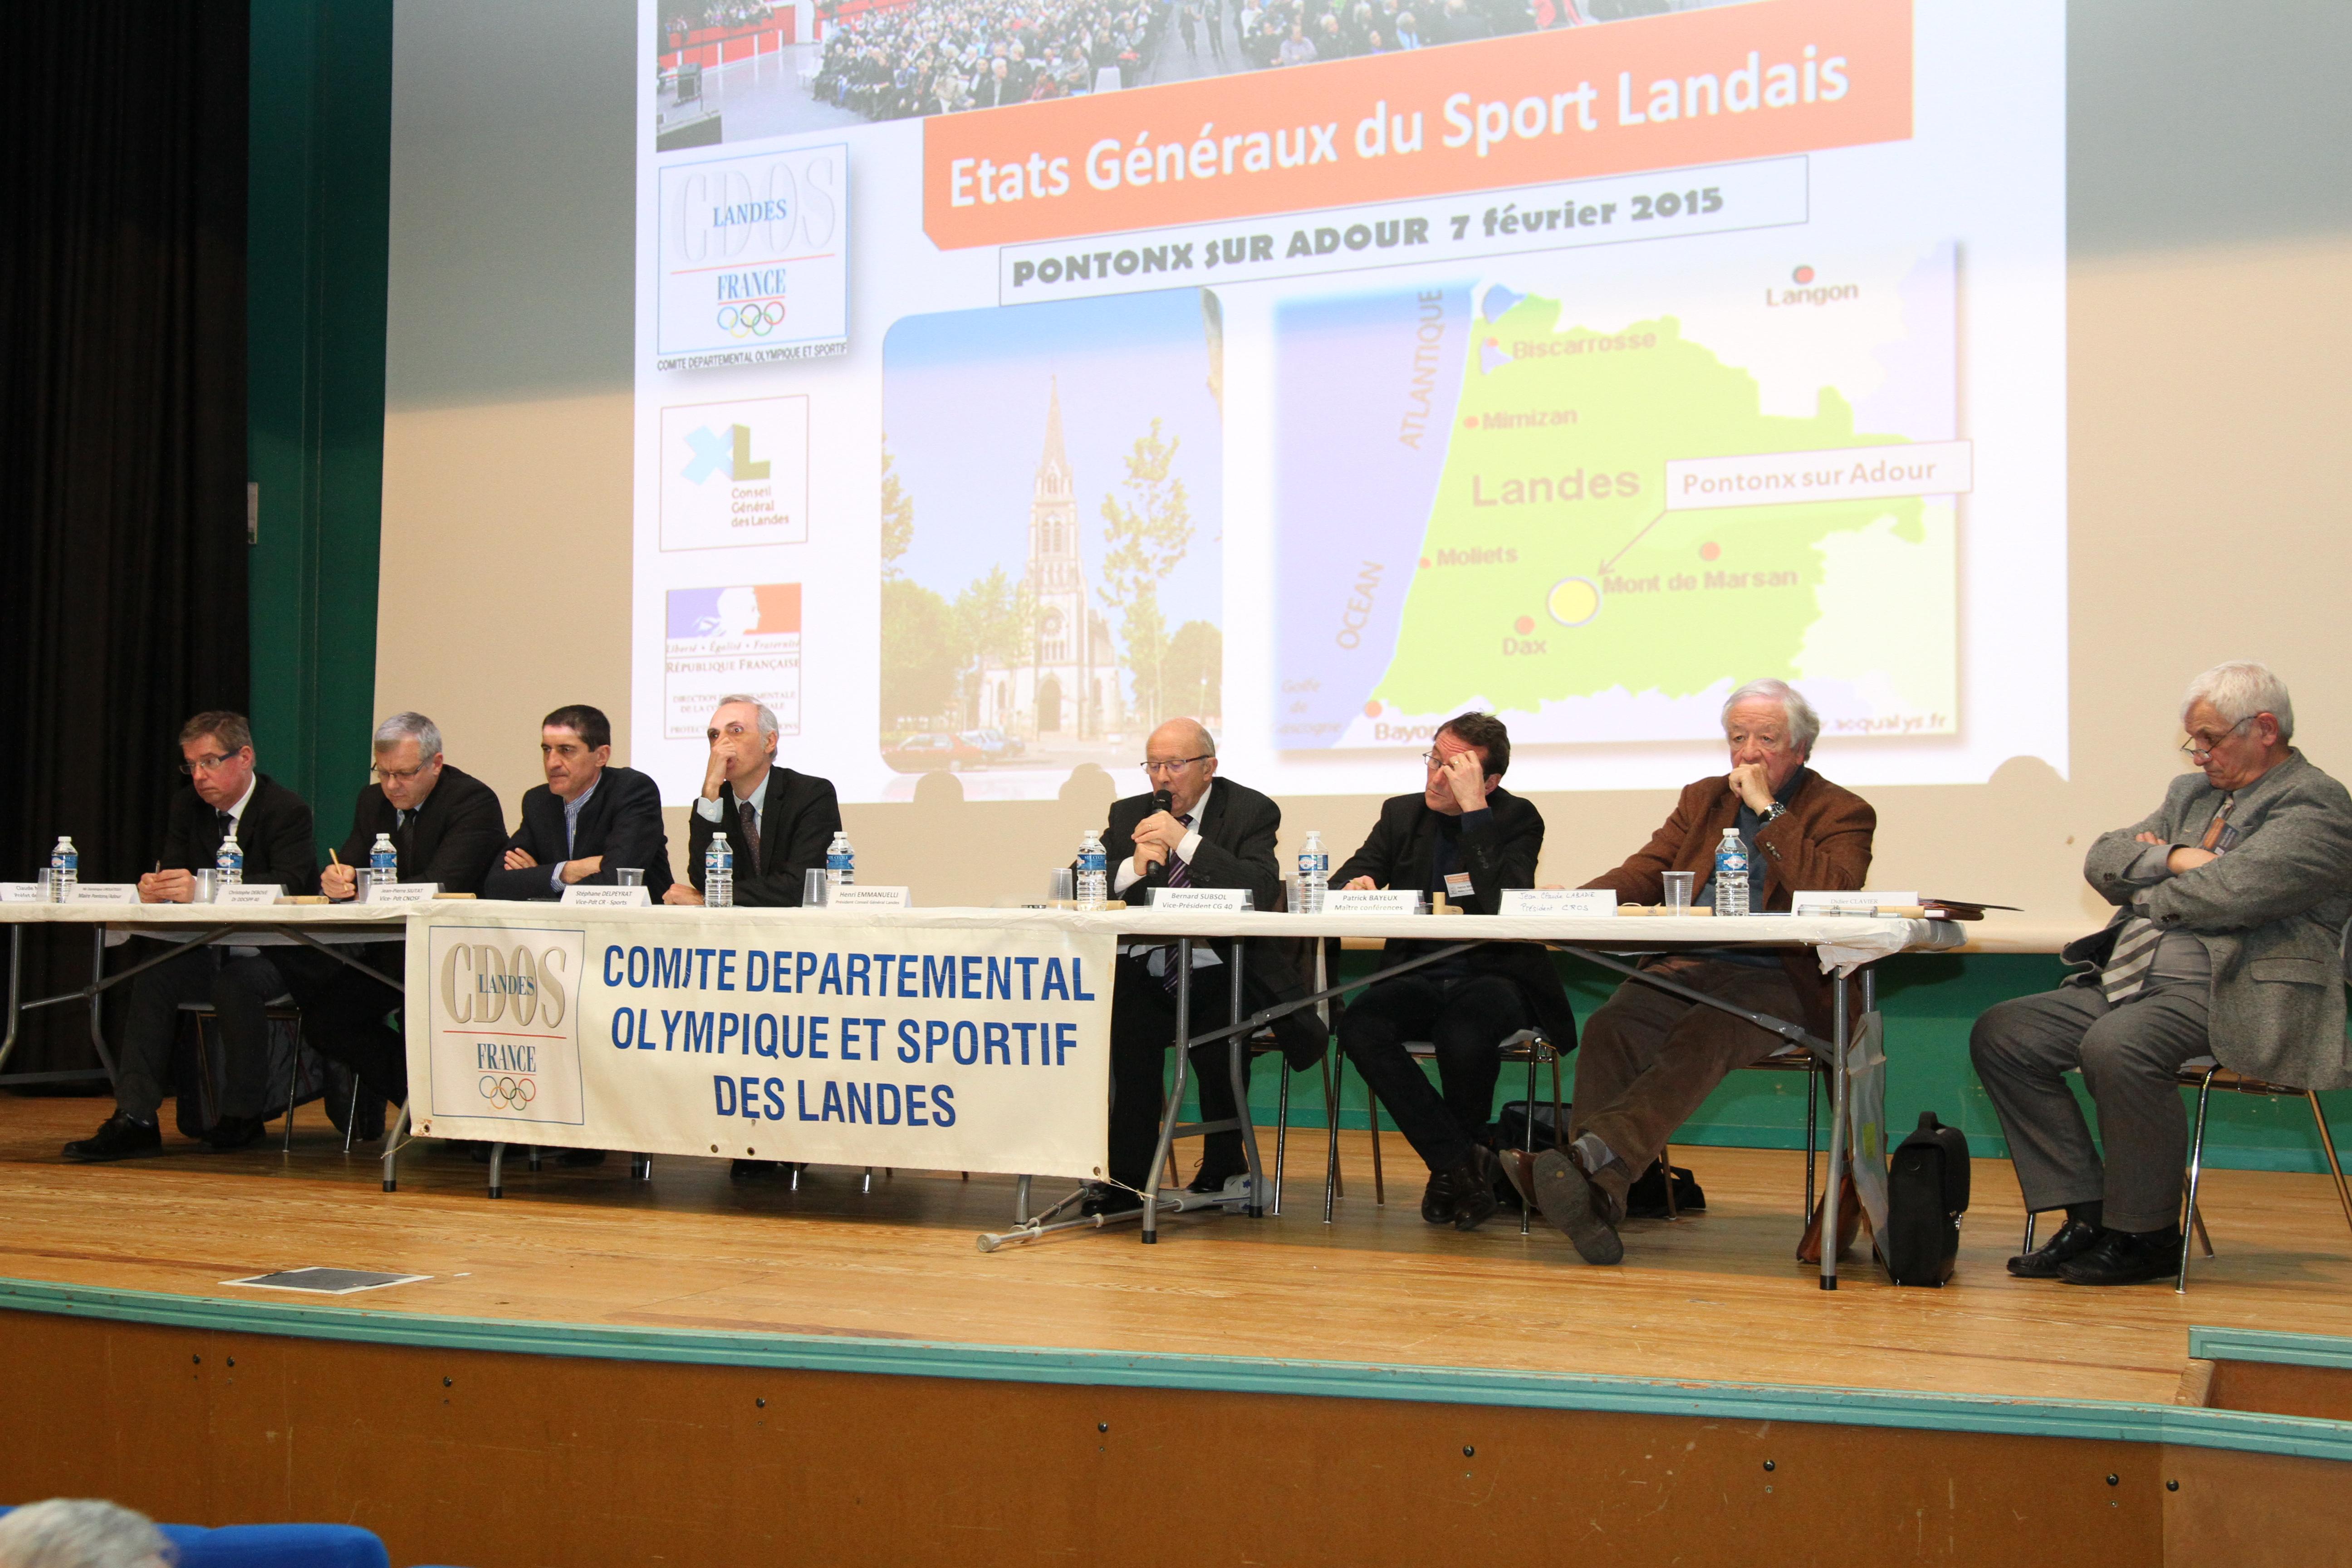 EGS landais 2015 (25)